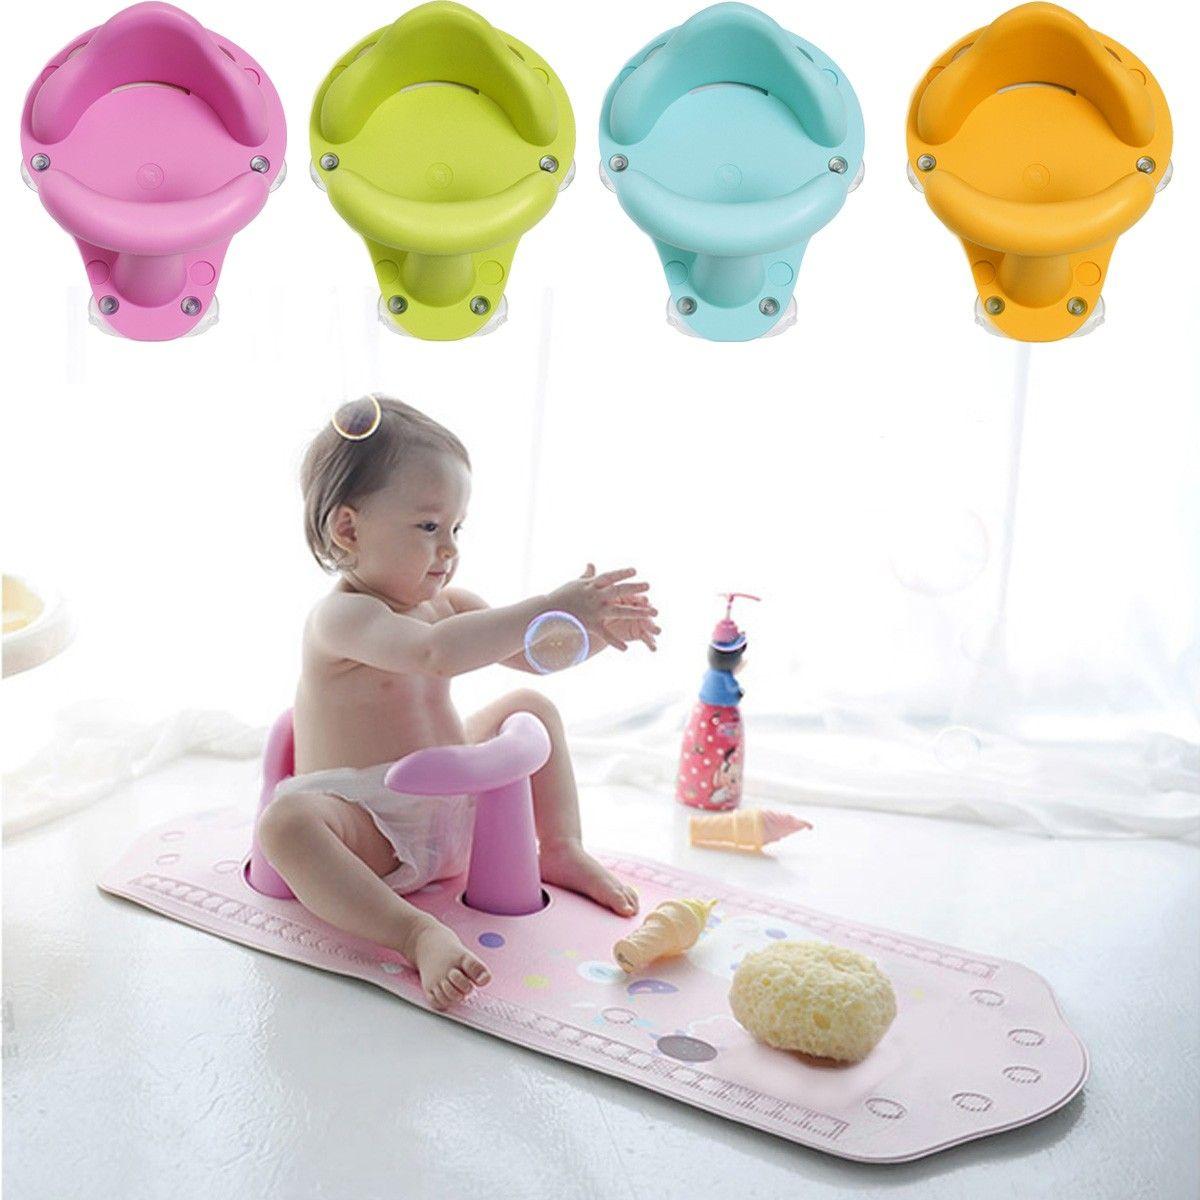 2018 Nonslip Baby Infant Kids Toddler Bath Seat Ring Safety Comfort ...